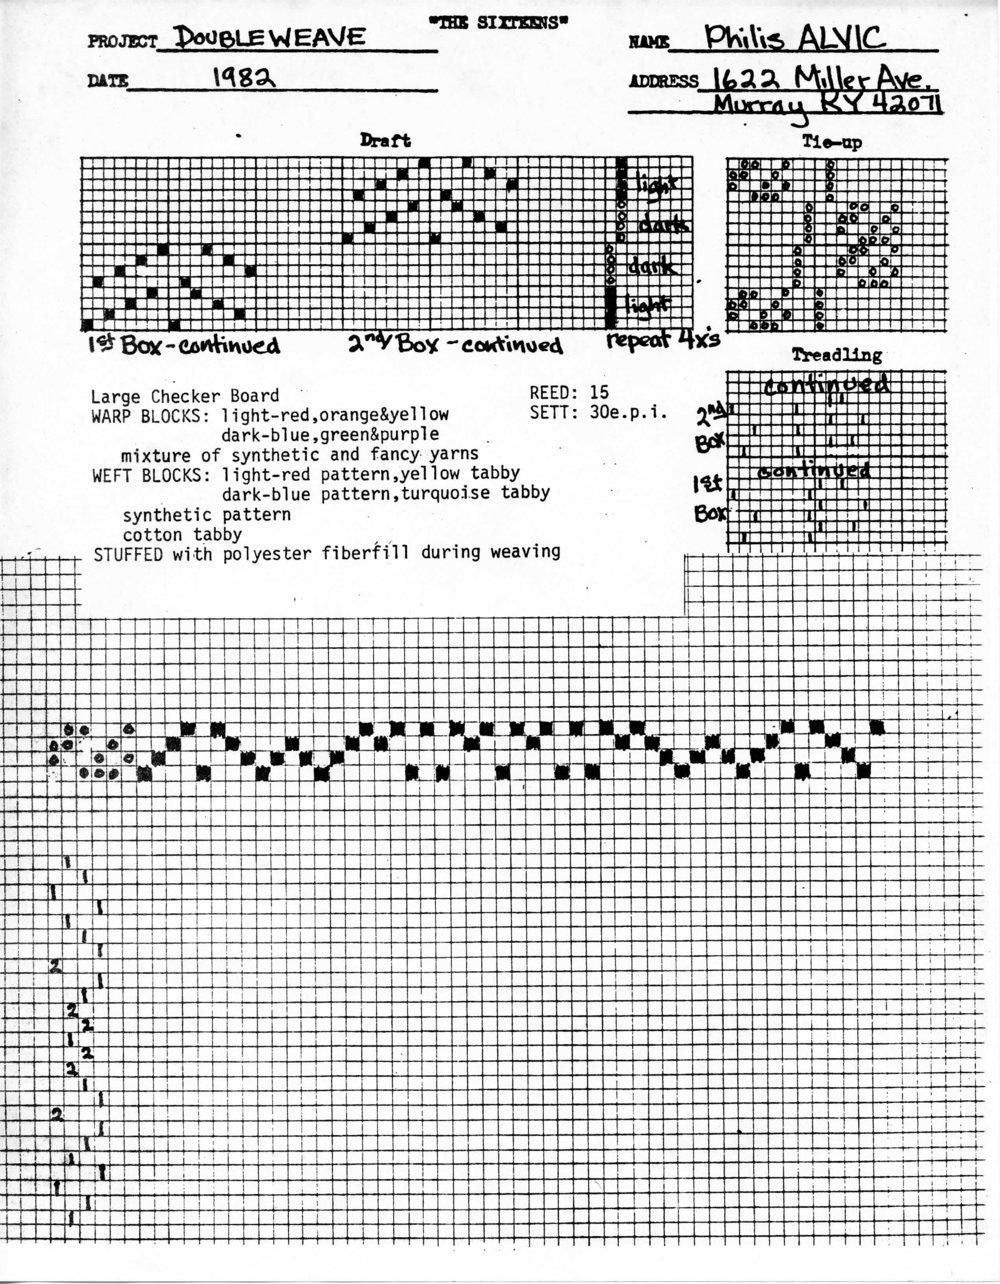 1982_Page_1_Image_0001.jpg